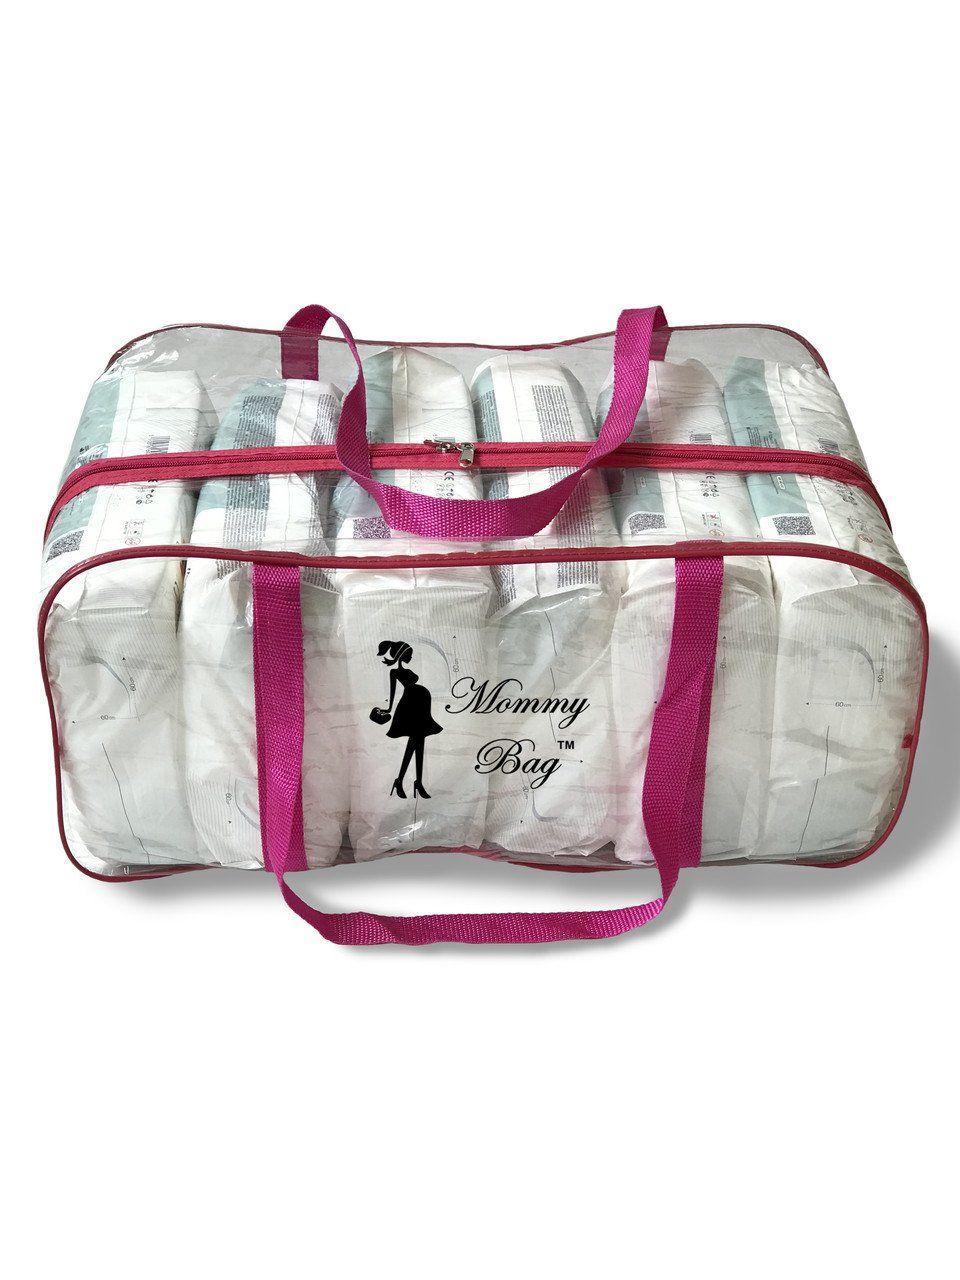 Сумка прозрачная в роддом Mommy Bag, размер - L, цвет - Розовый